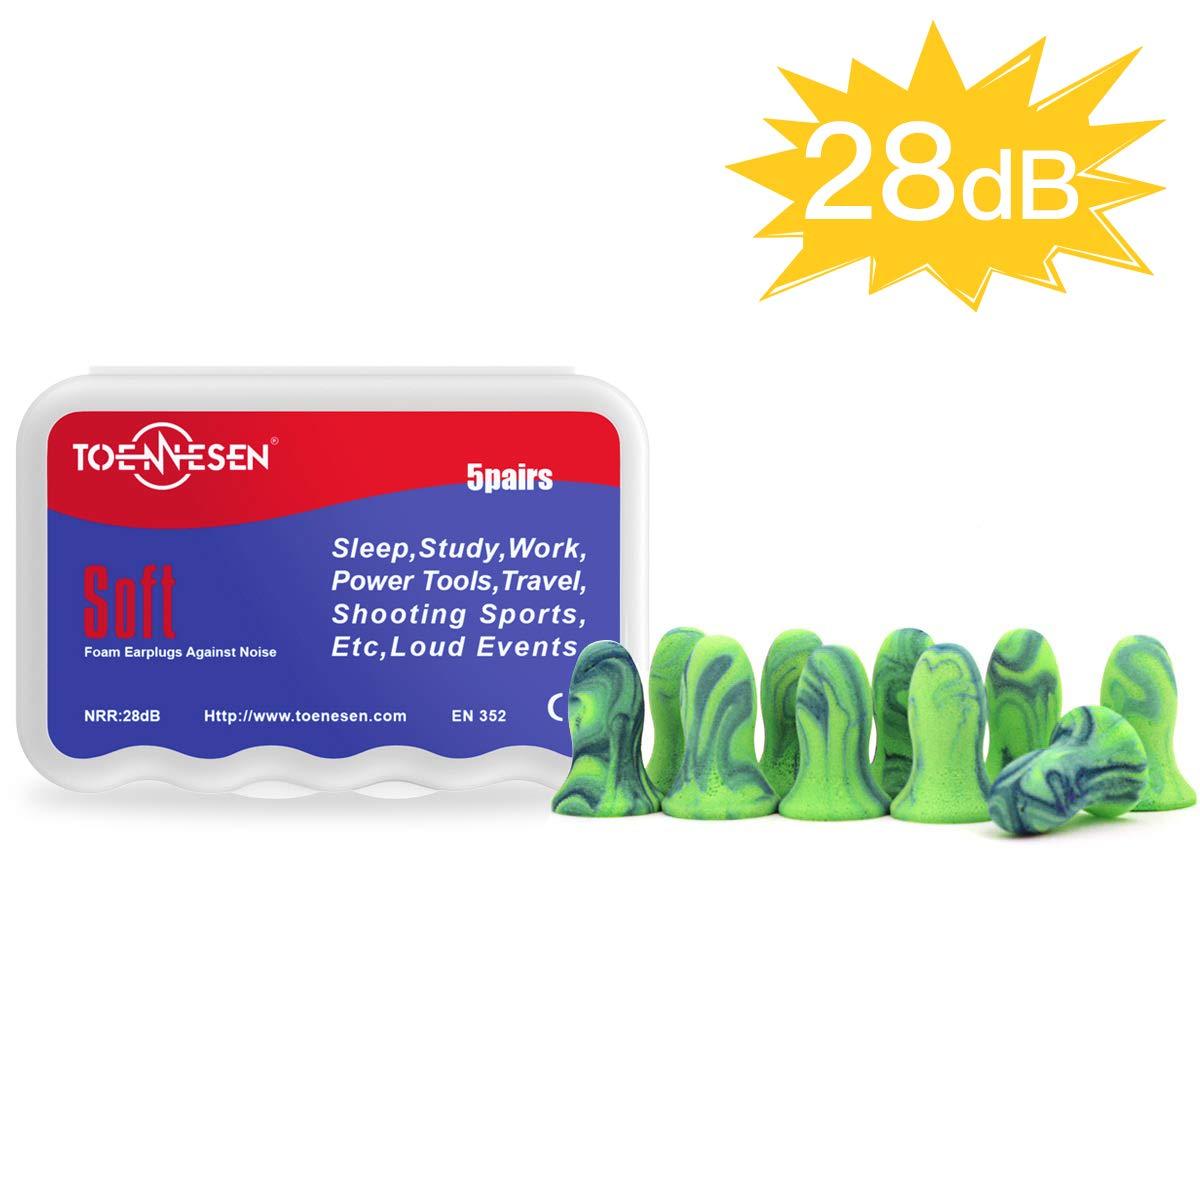 Toennesen Waterproof Ultra Soft Foam Earplugs with Storage Box for sleeping Studying